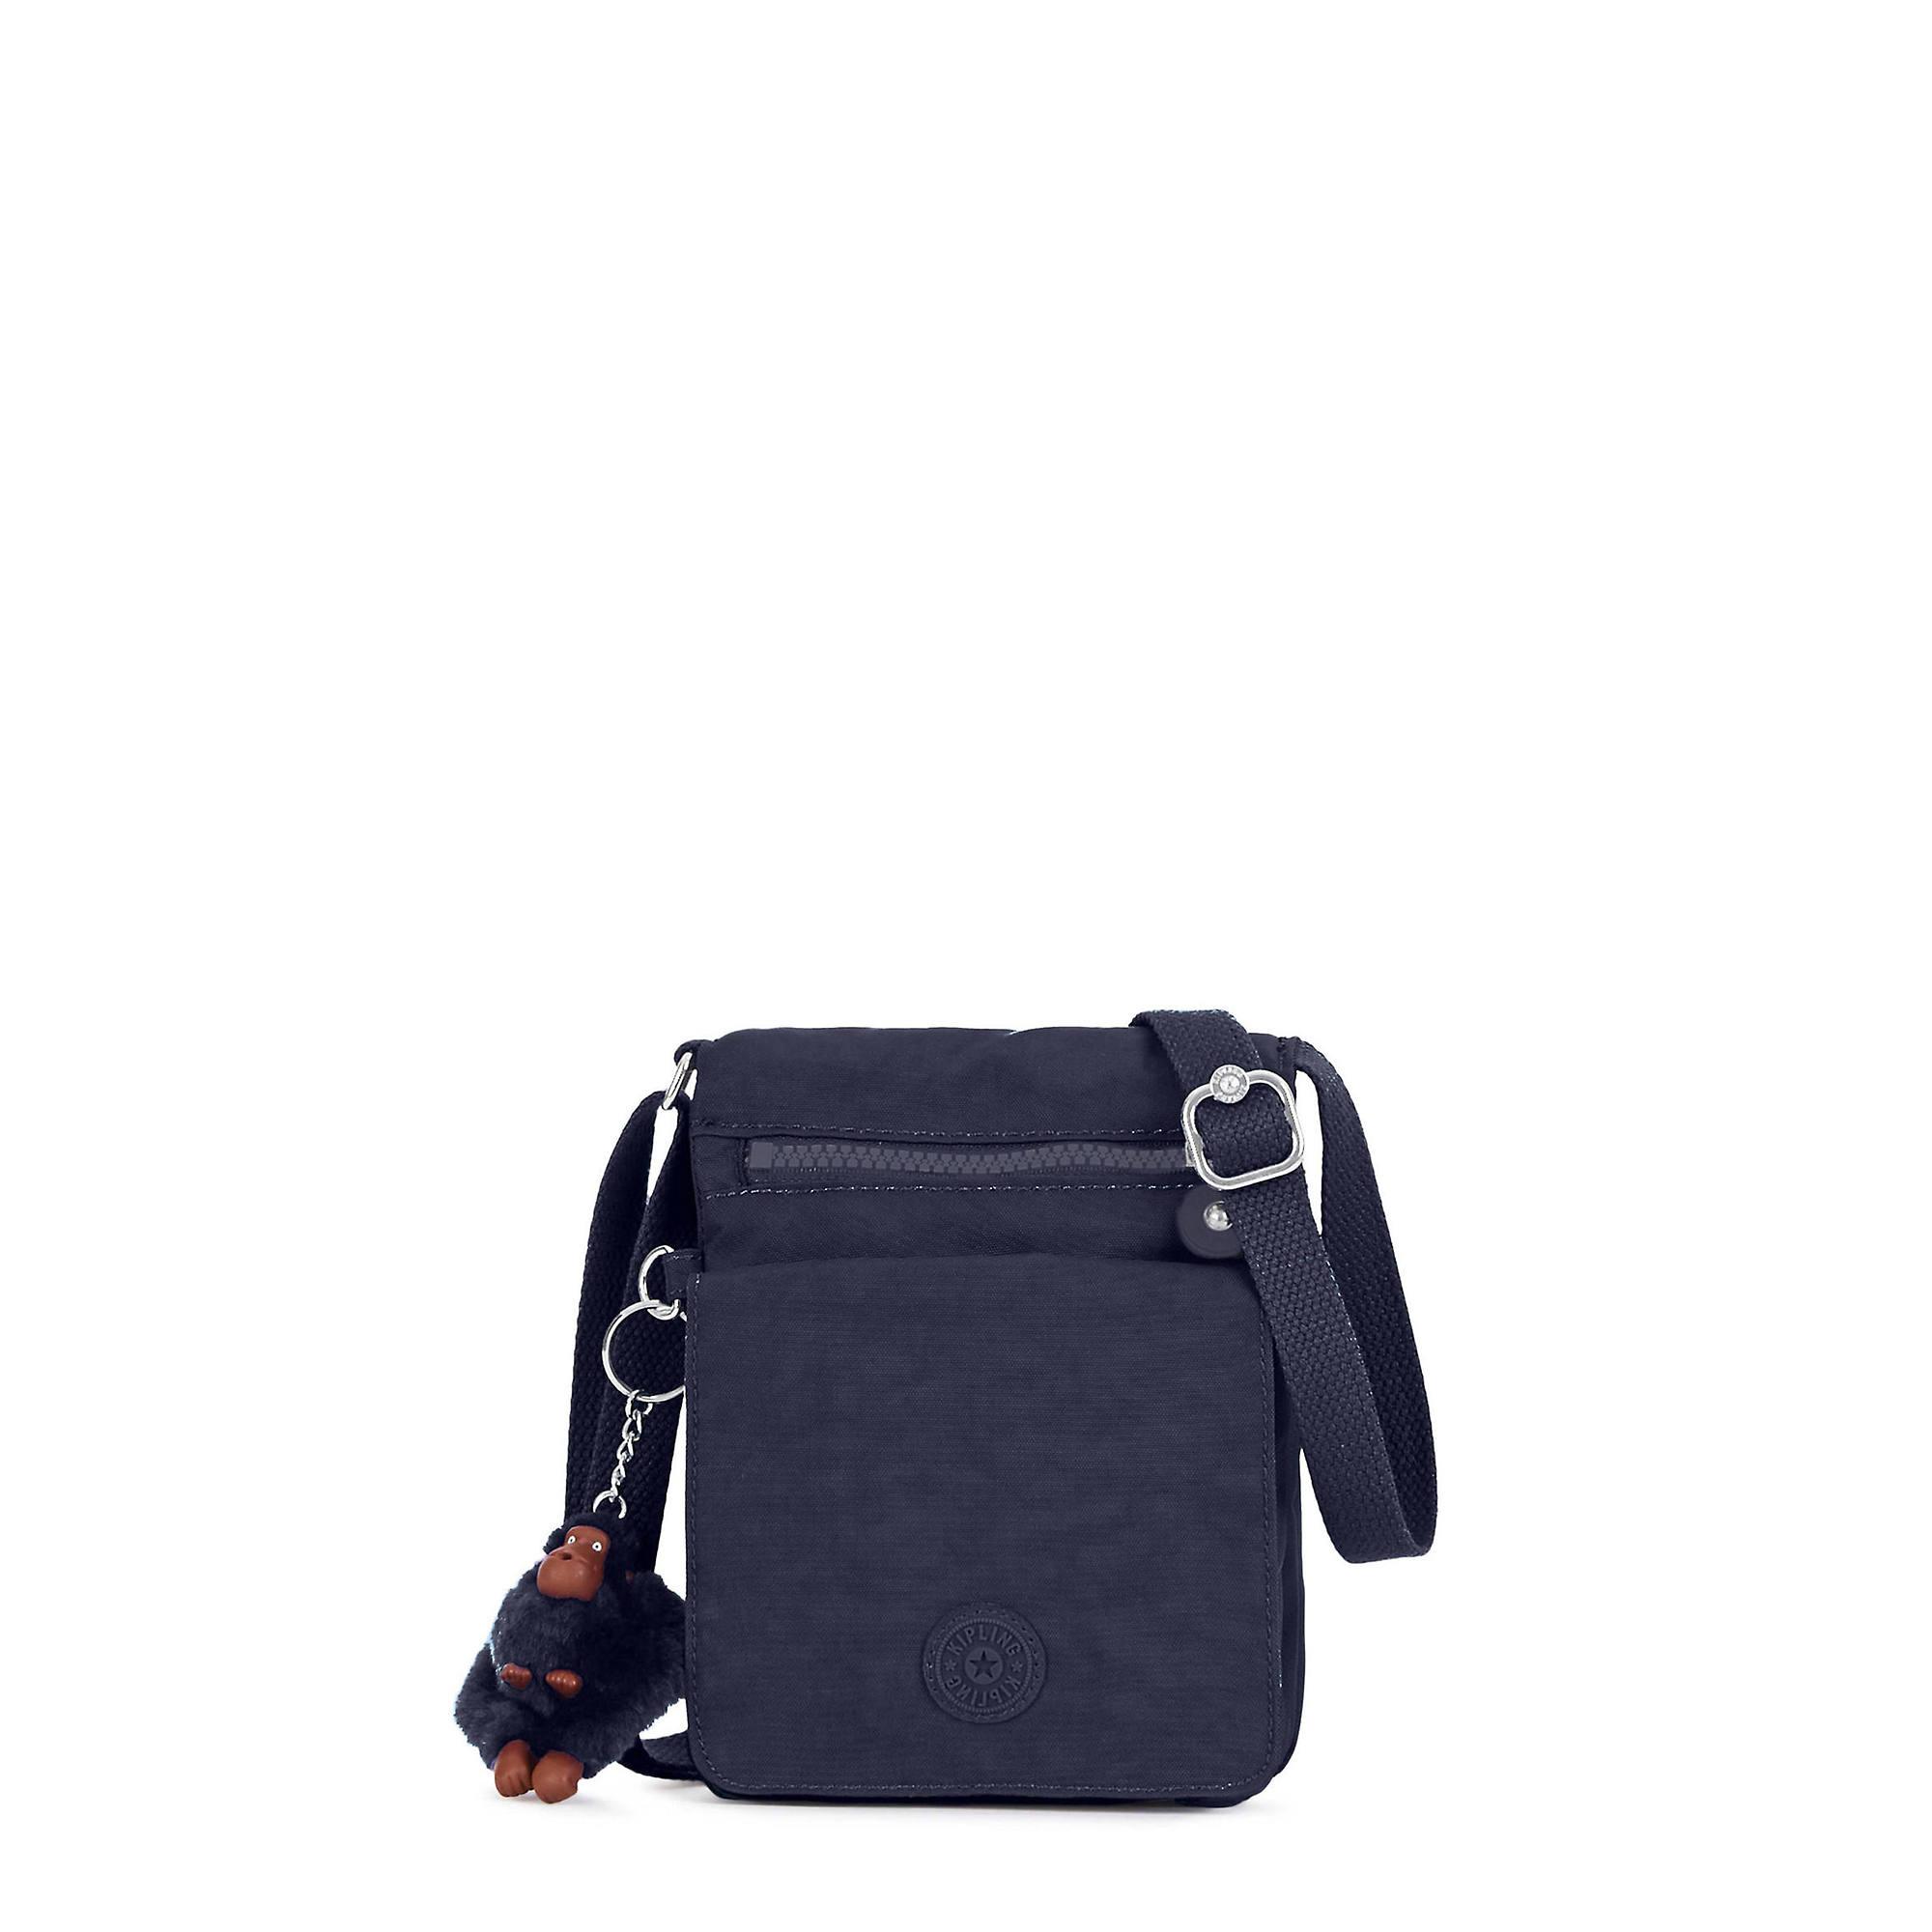 Kipling Eldorado Crossbody Bag